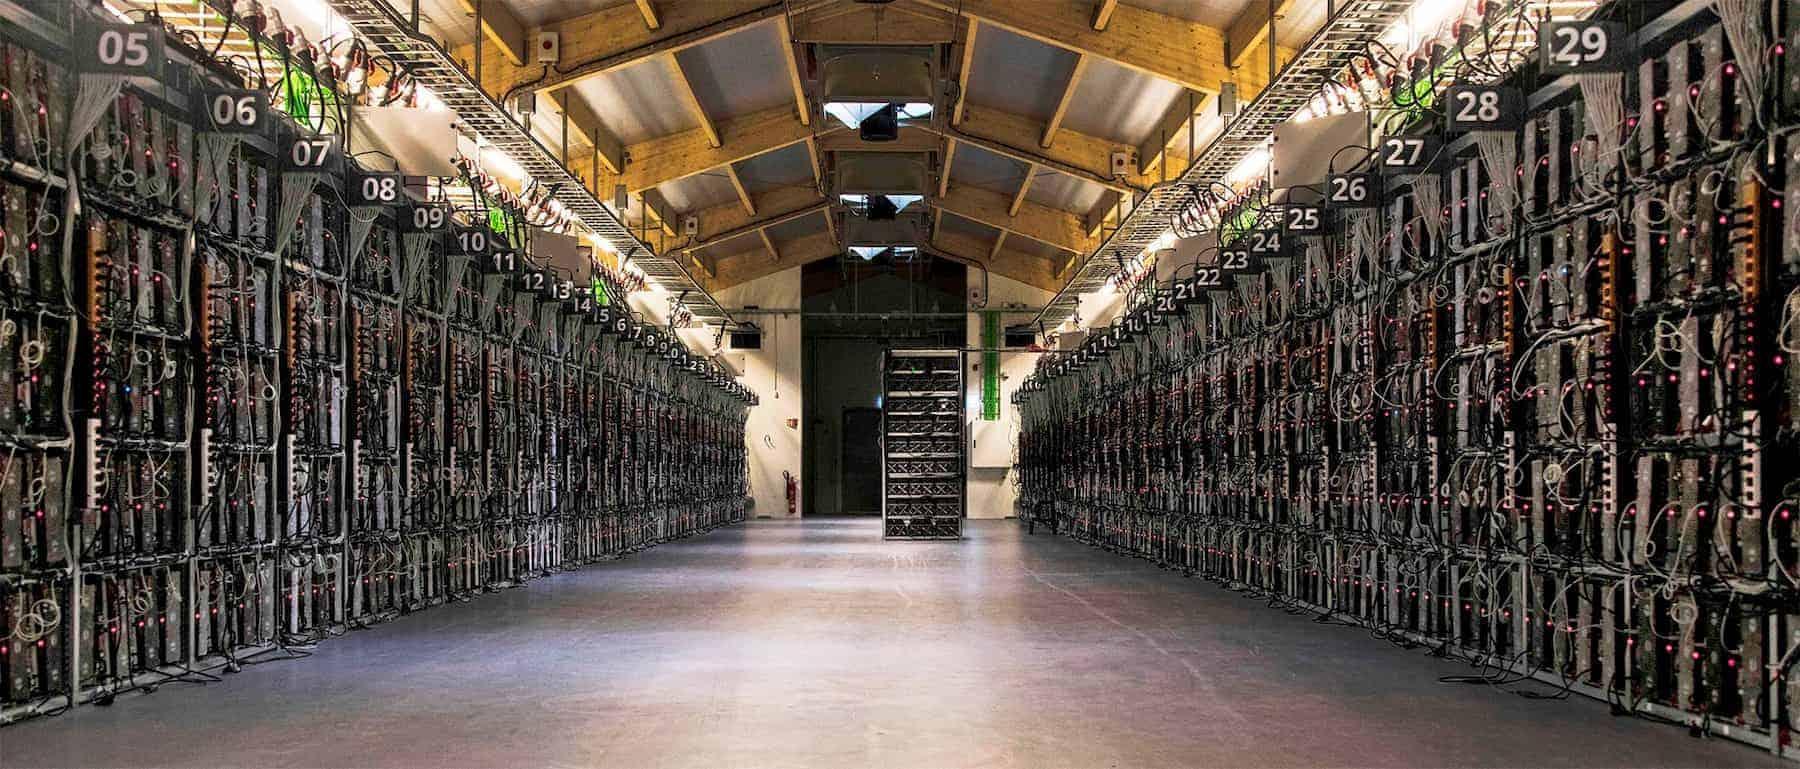 como minerar bitcoin ištraukite bitcoin į usd